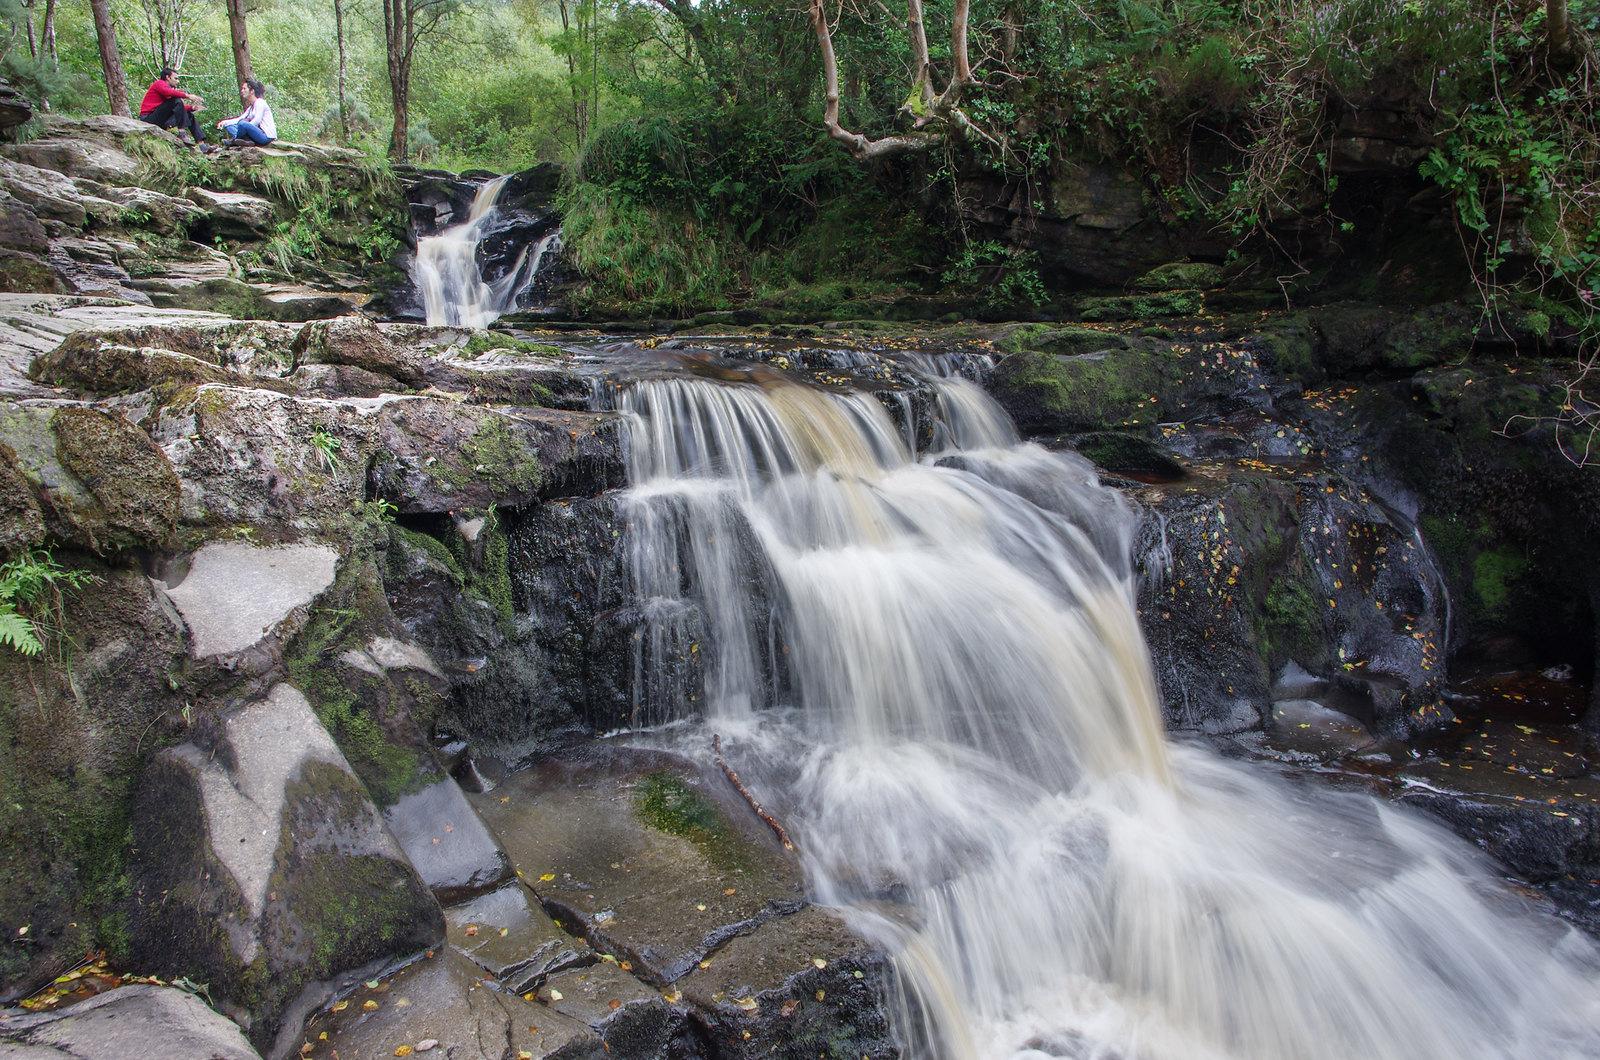 Slieve bloom mountains - Carnet de voyage en Irlande